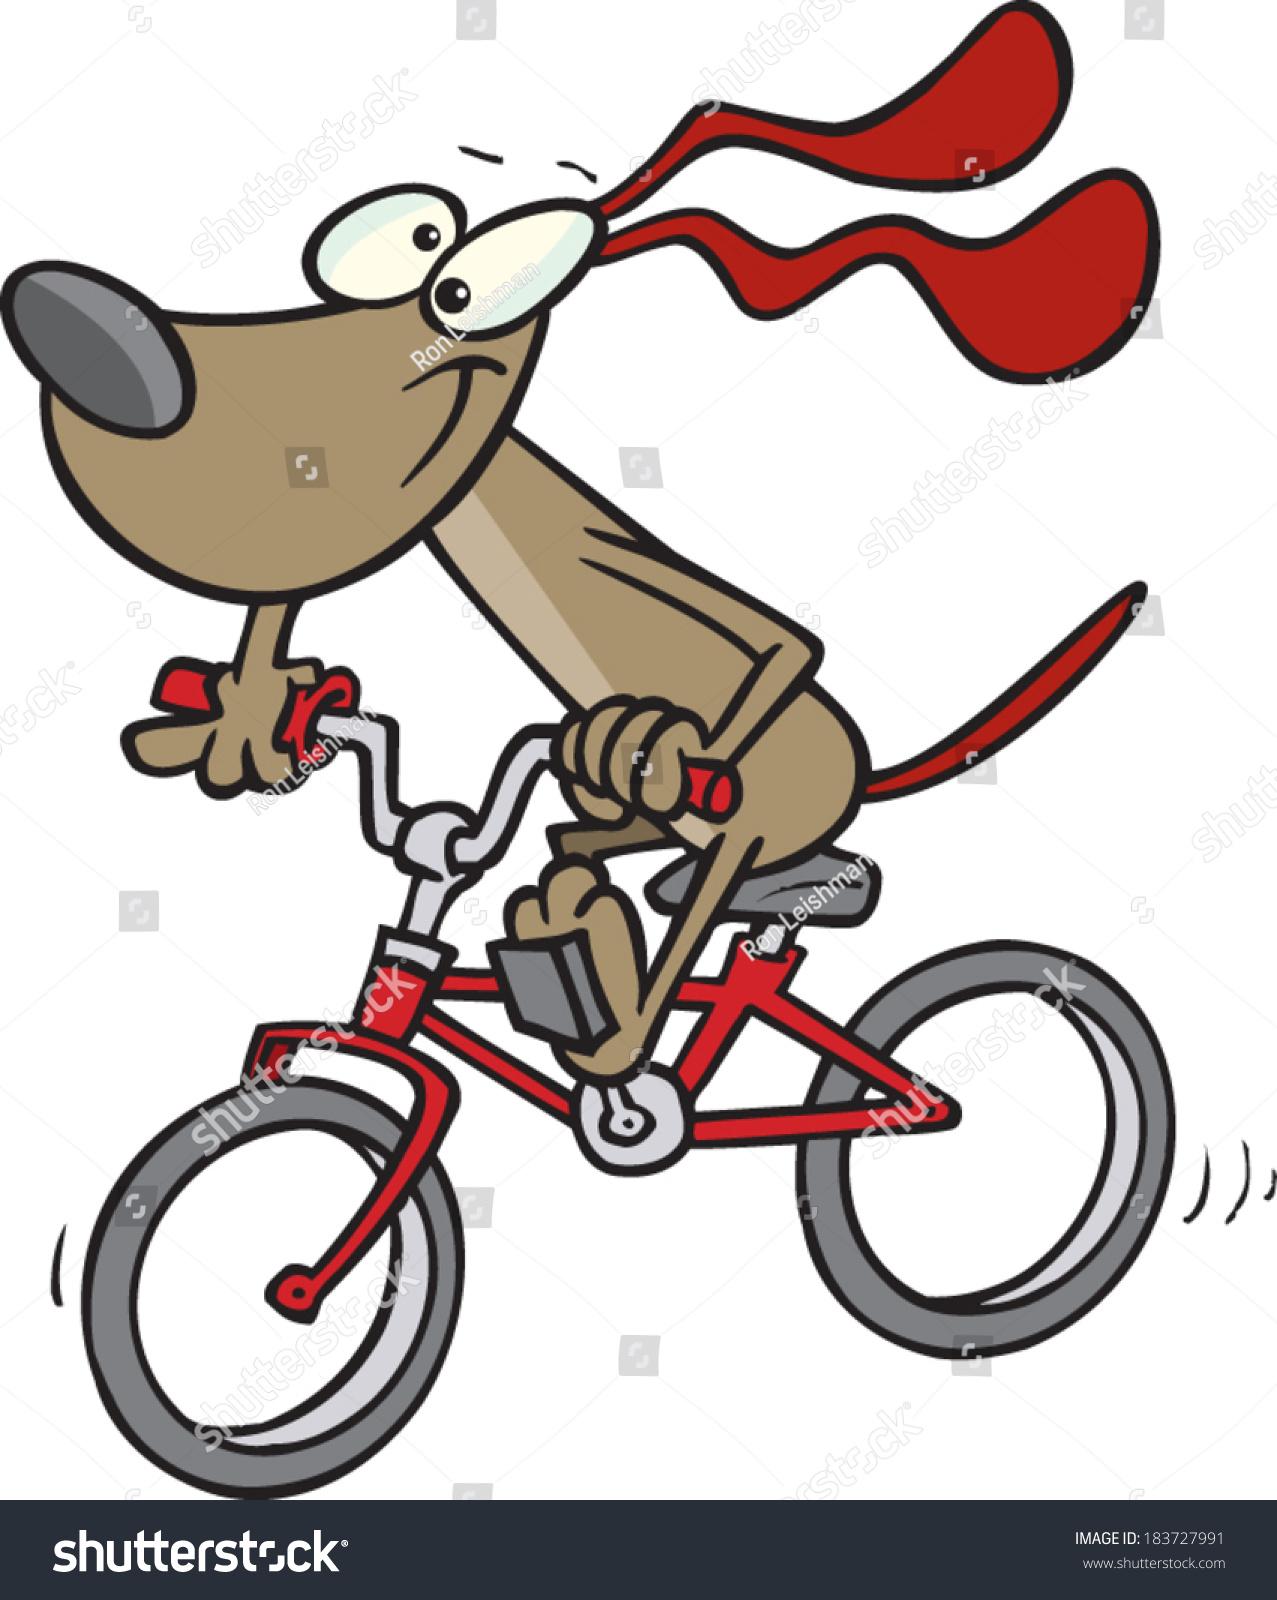 Cartoon Dog Riding Bike Stock Vector 183727991 - Shutterstock